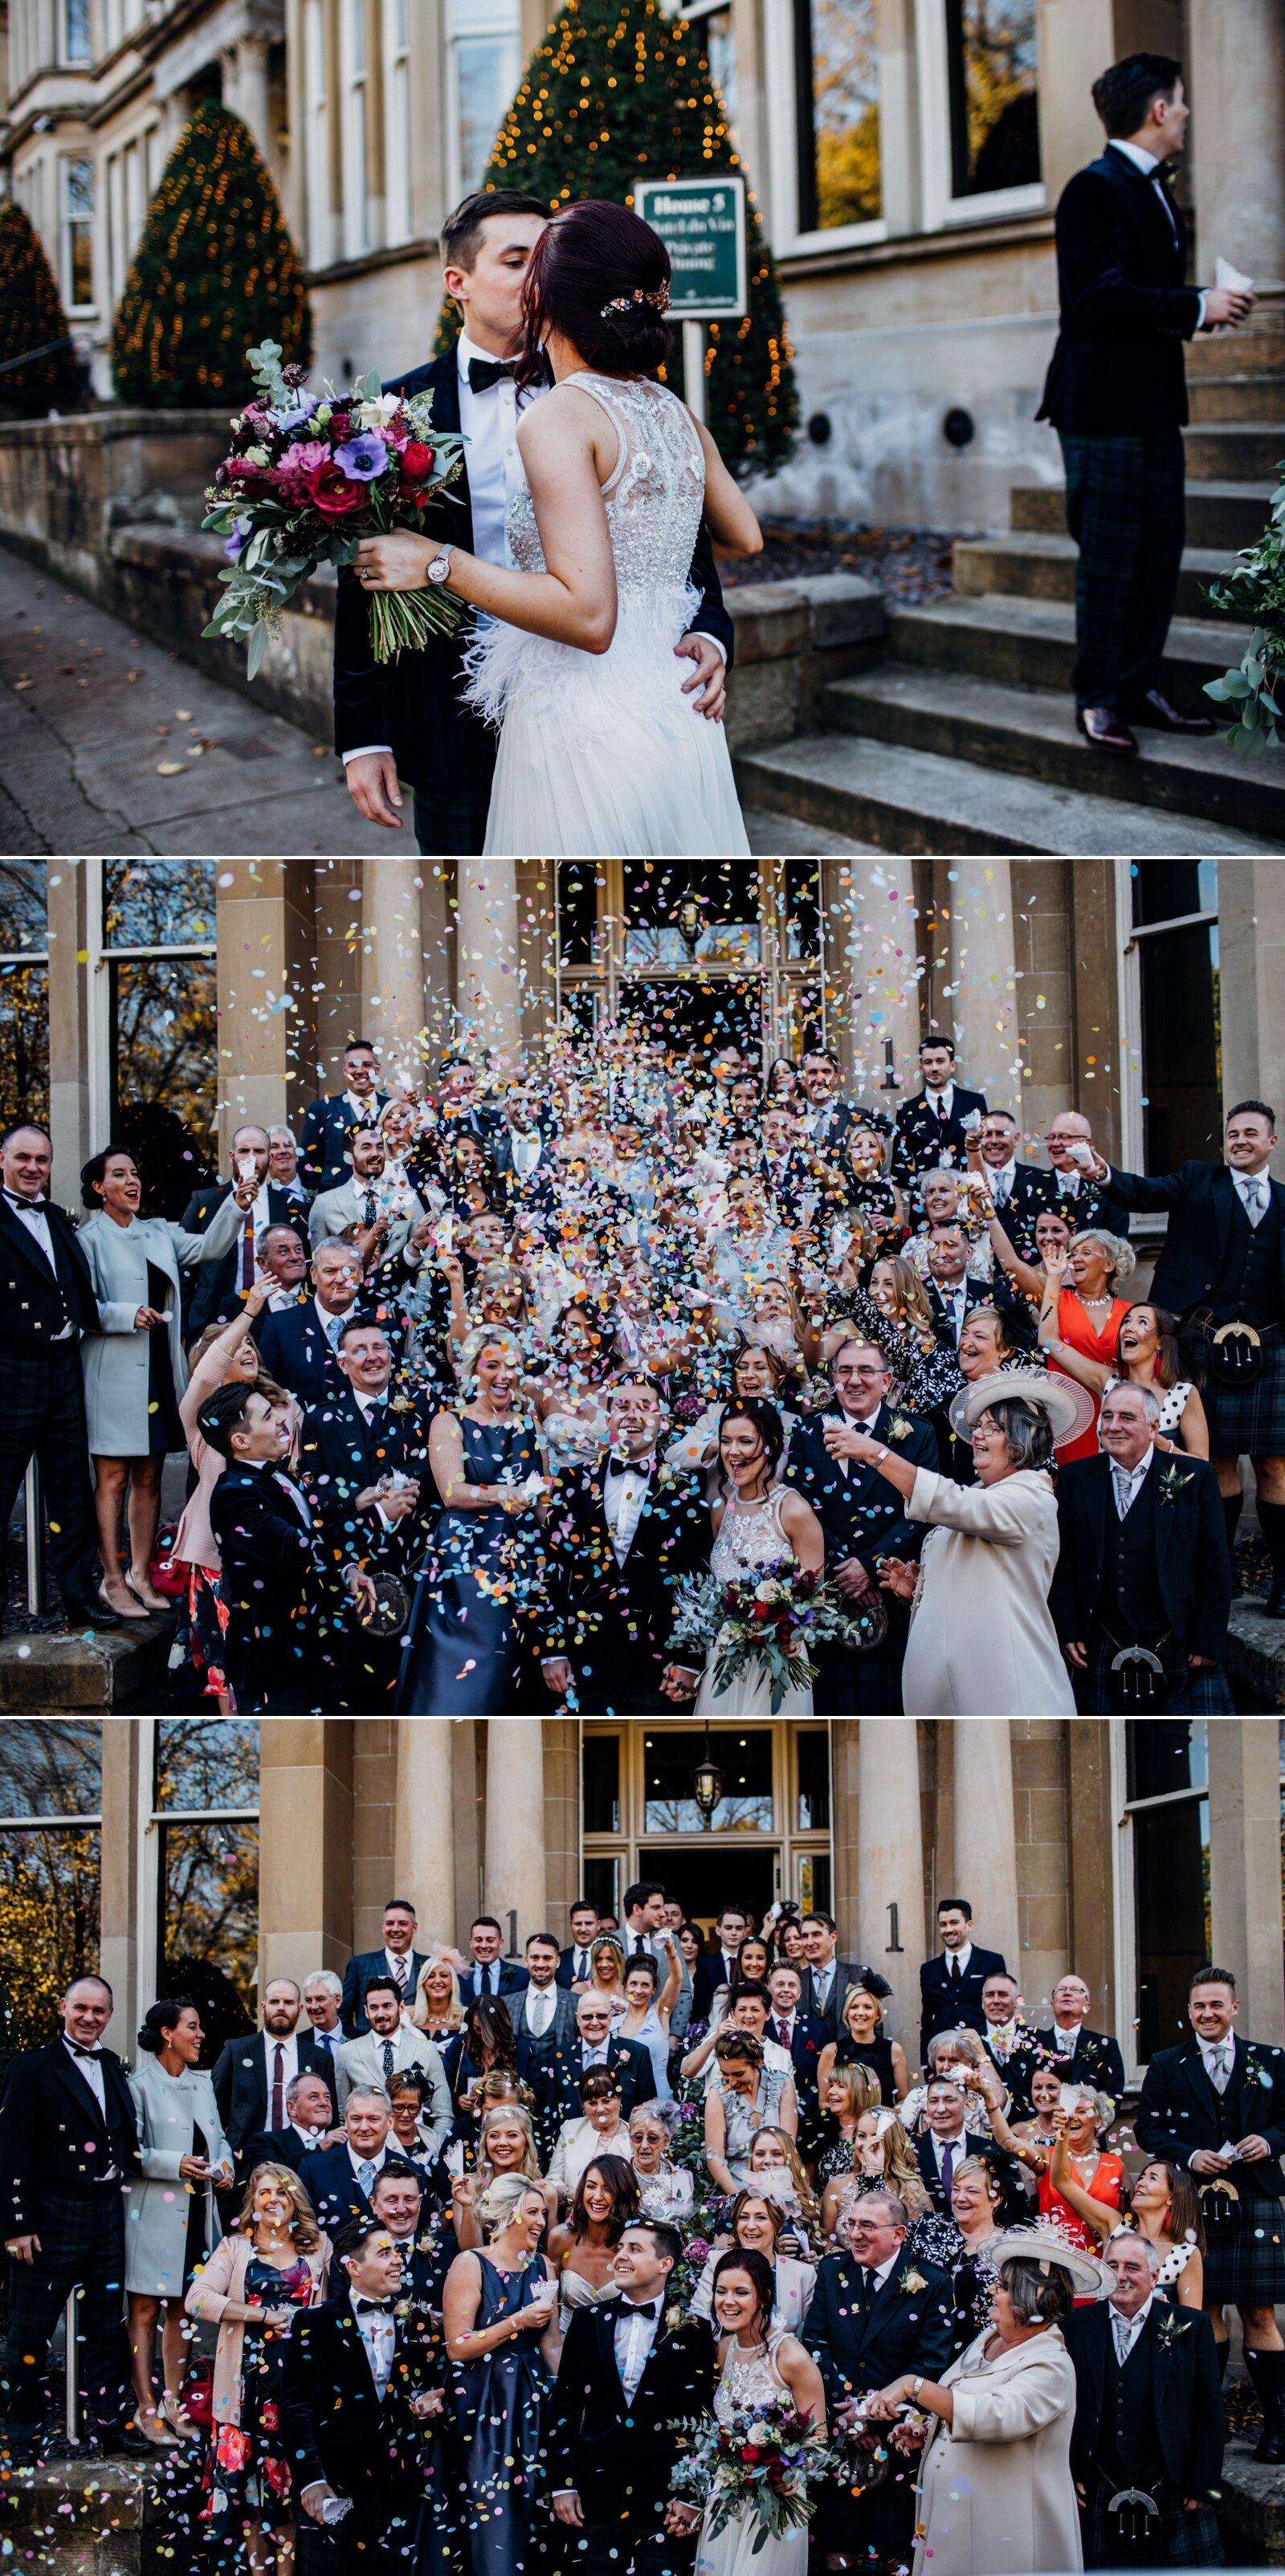 Andy&Szerdi-Photography_Ceremony_Elaine-Stephen-33.jpg